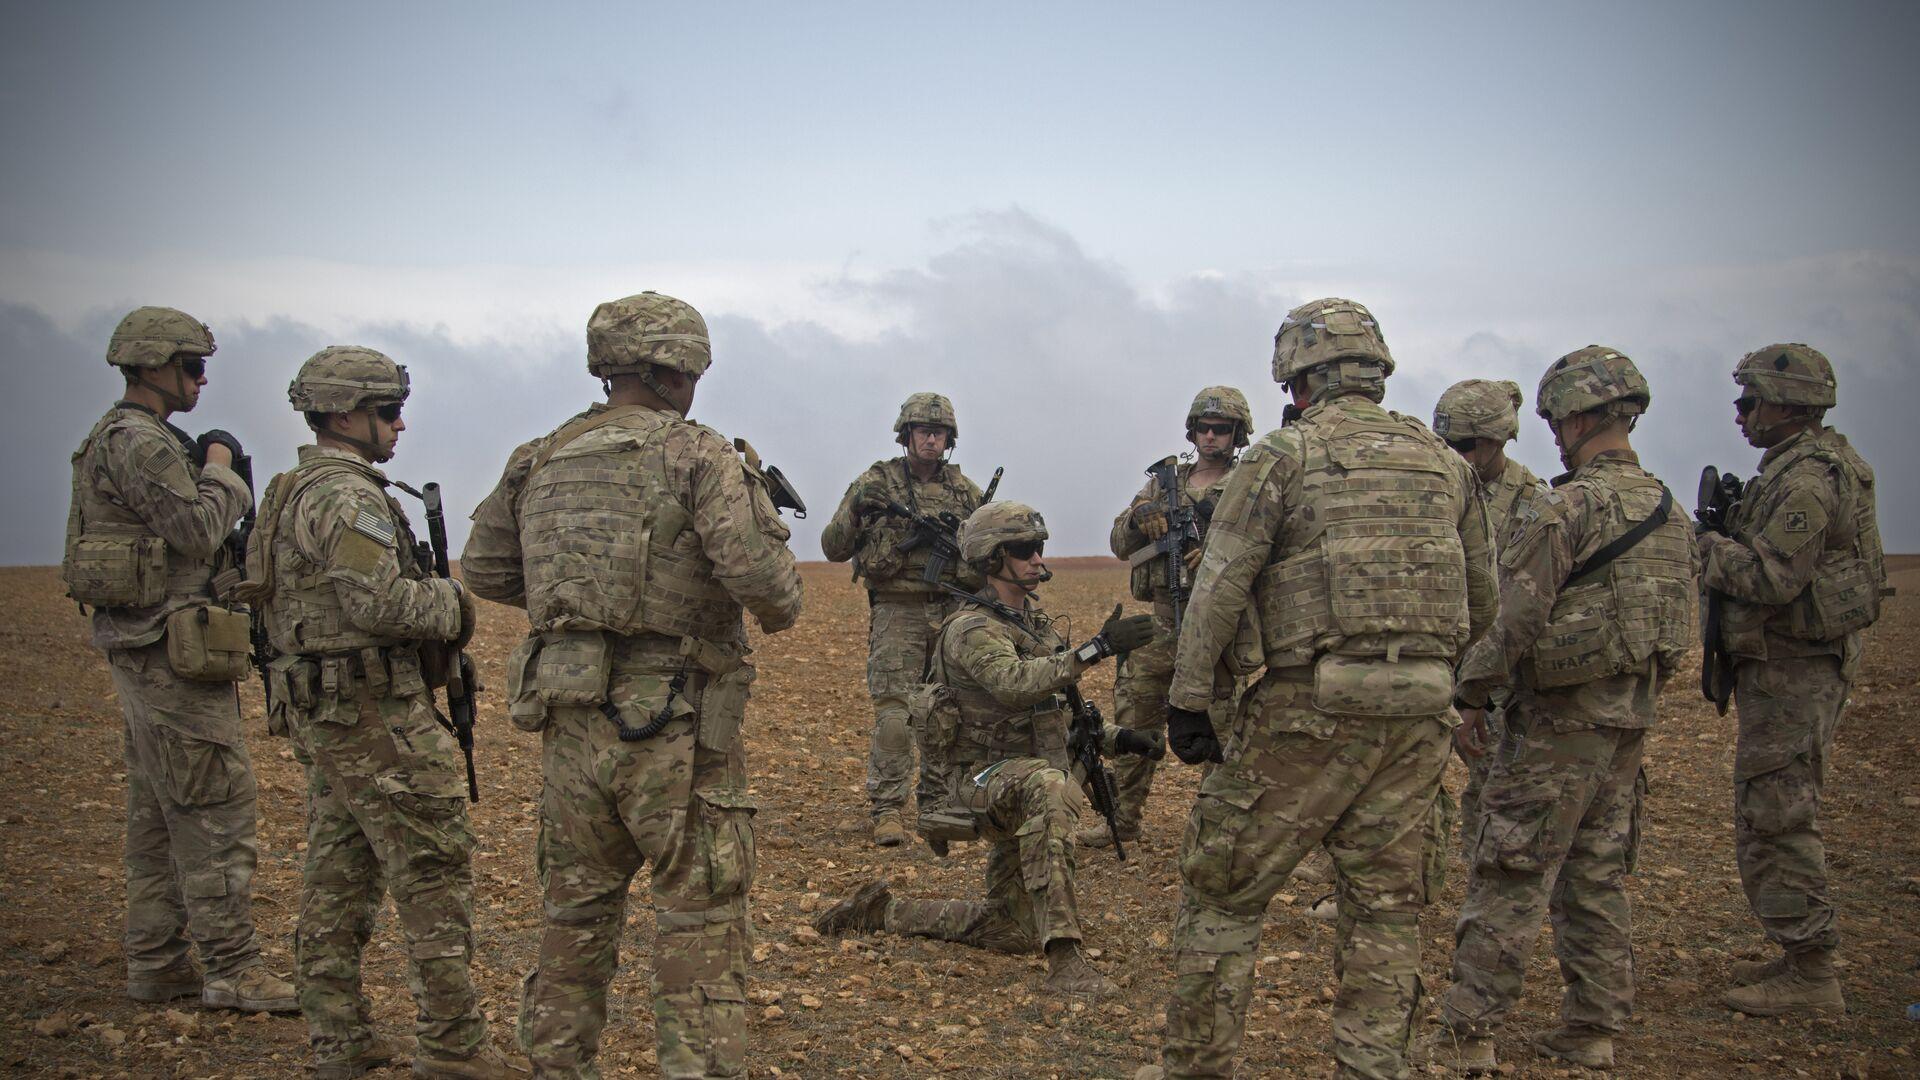 Militaires US à Manbij, en Syrie - Sputnik France, 1920, 21.09.2021